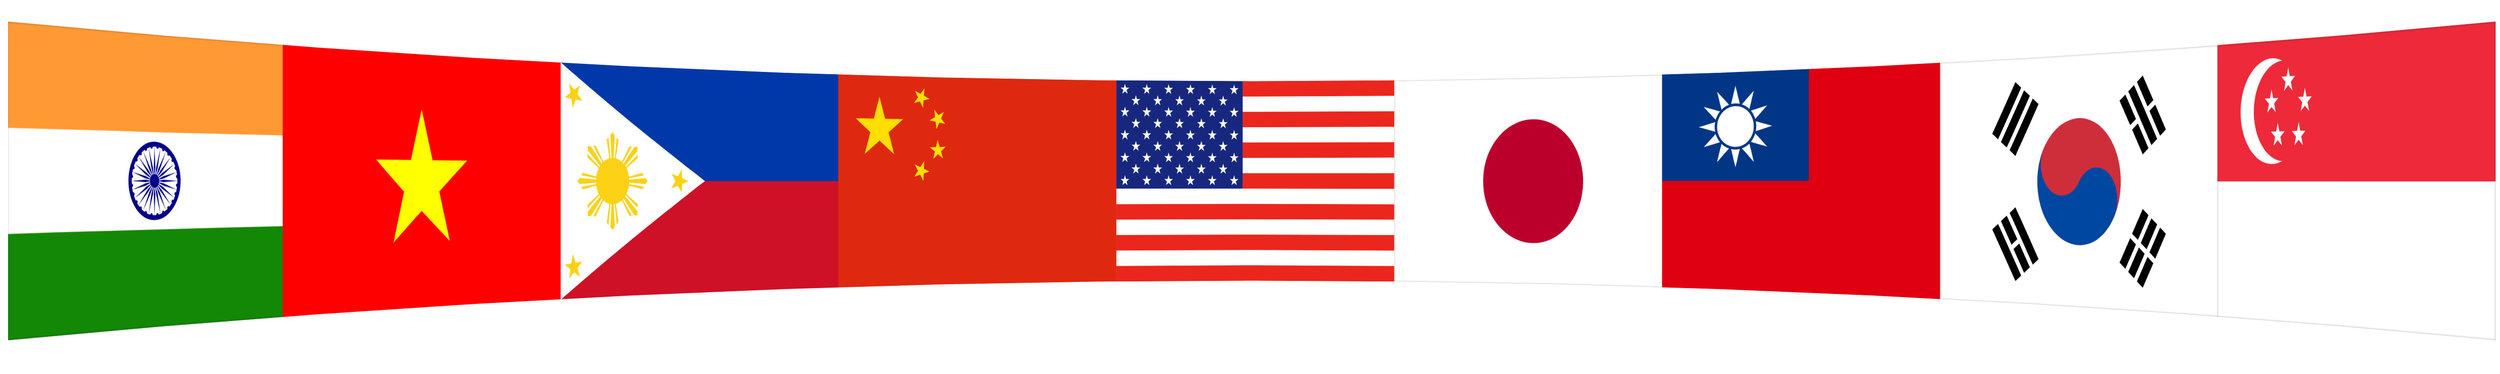 All_Flags_sized_Long_a.jpg